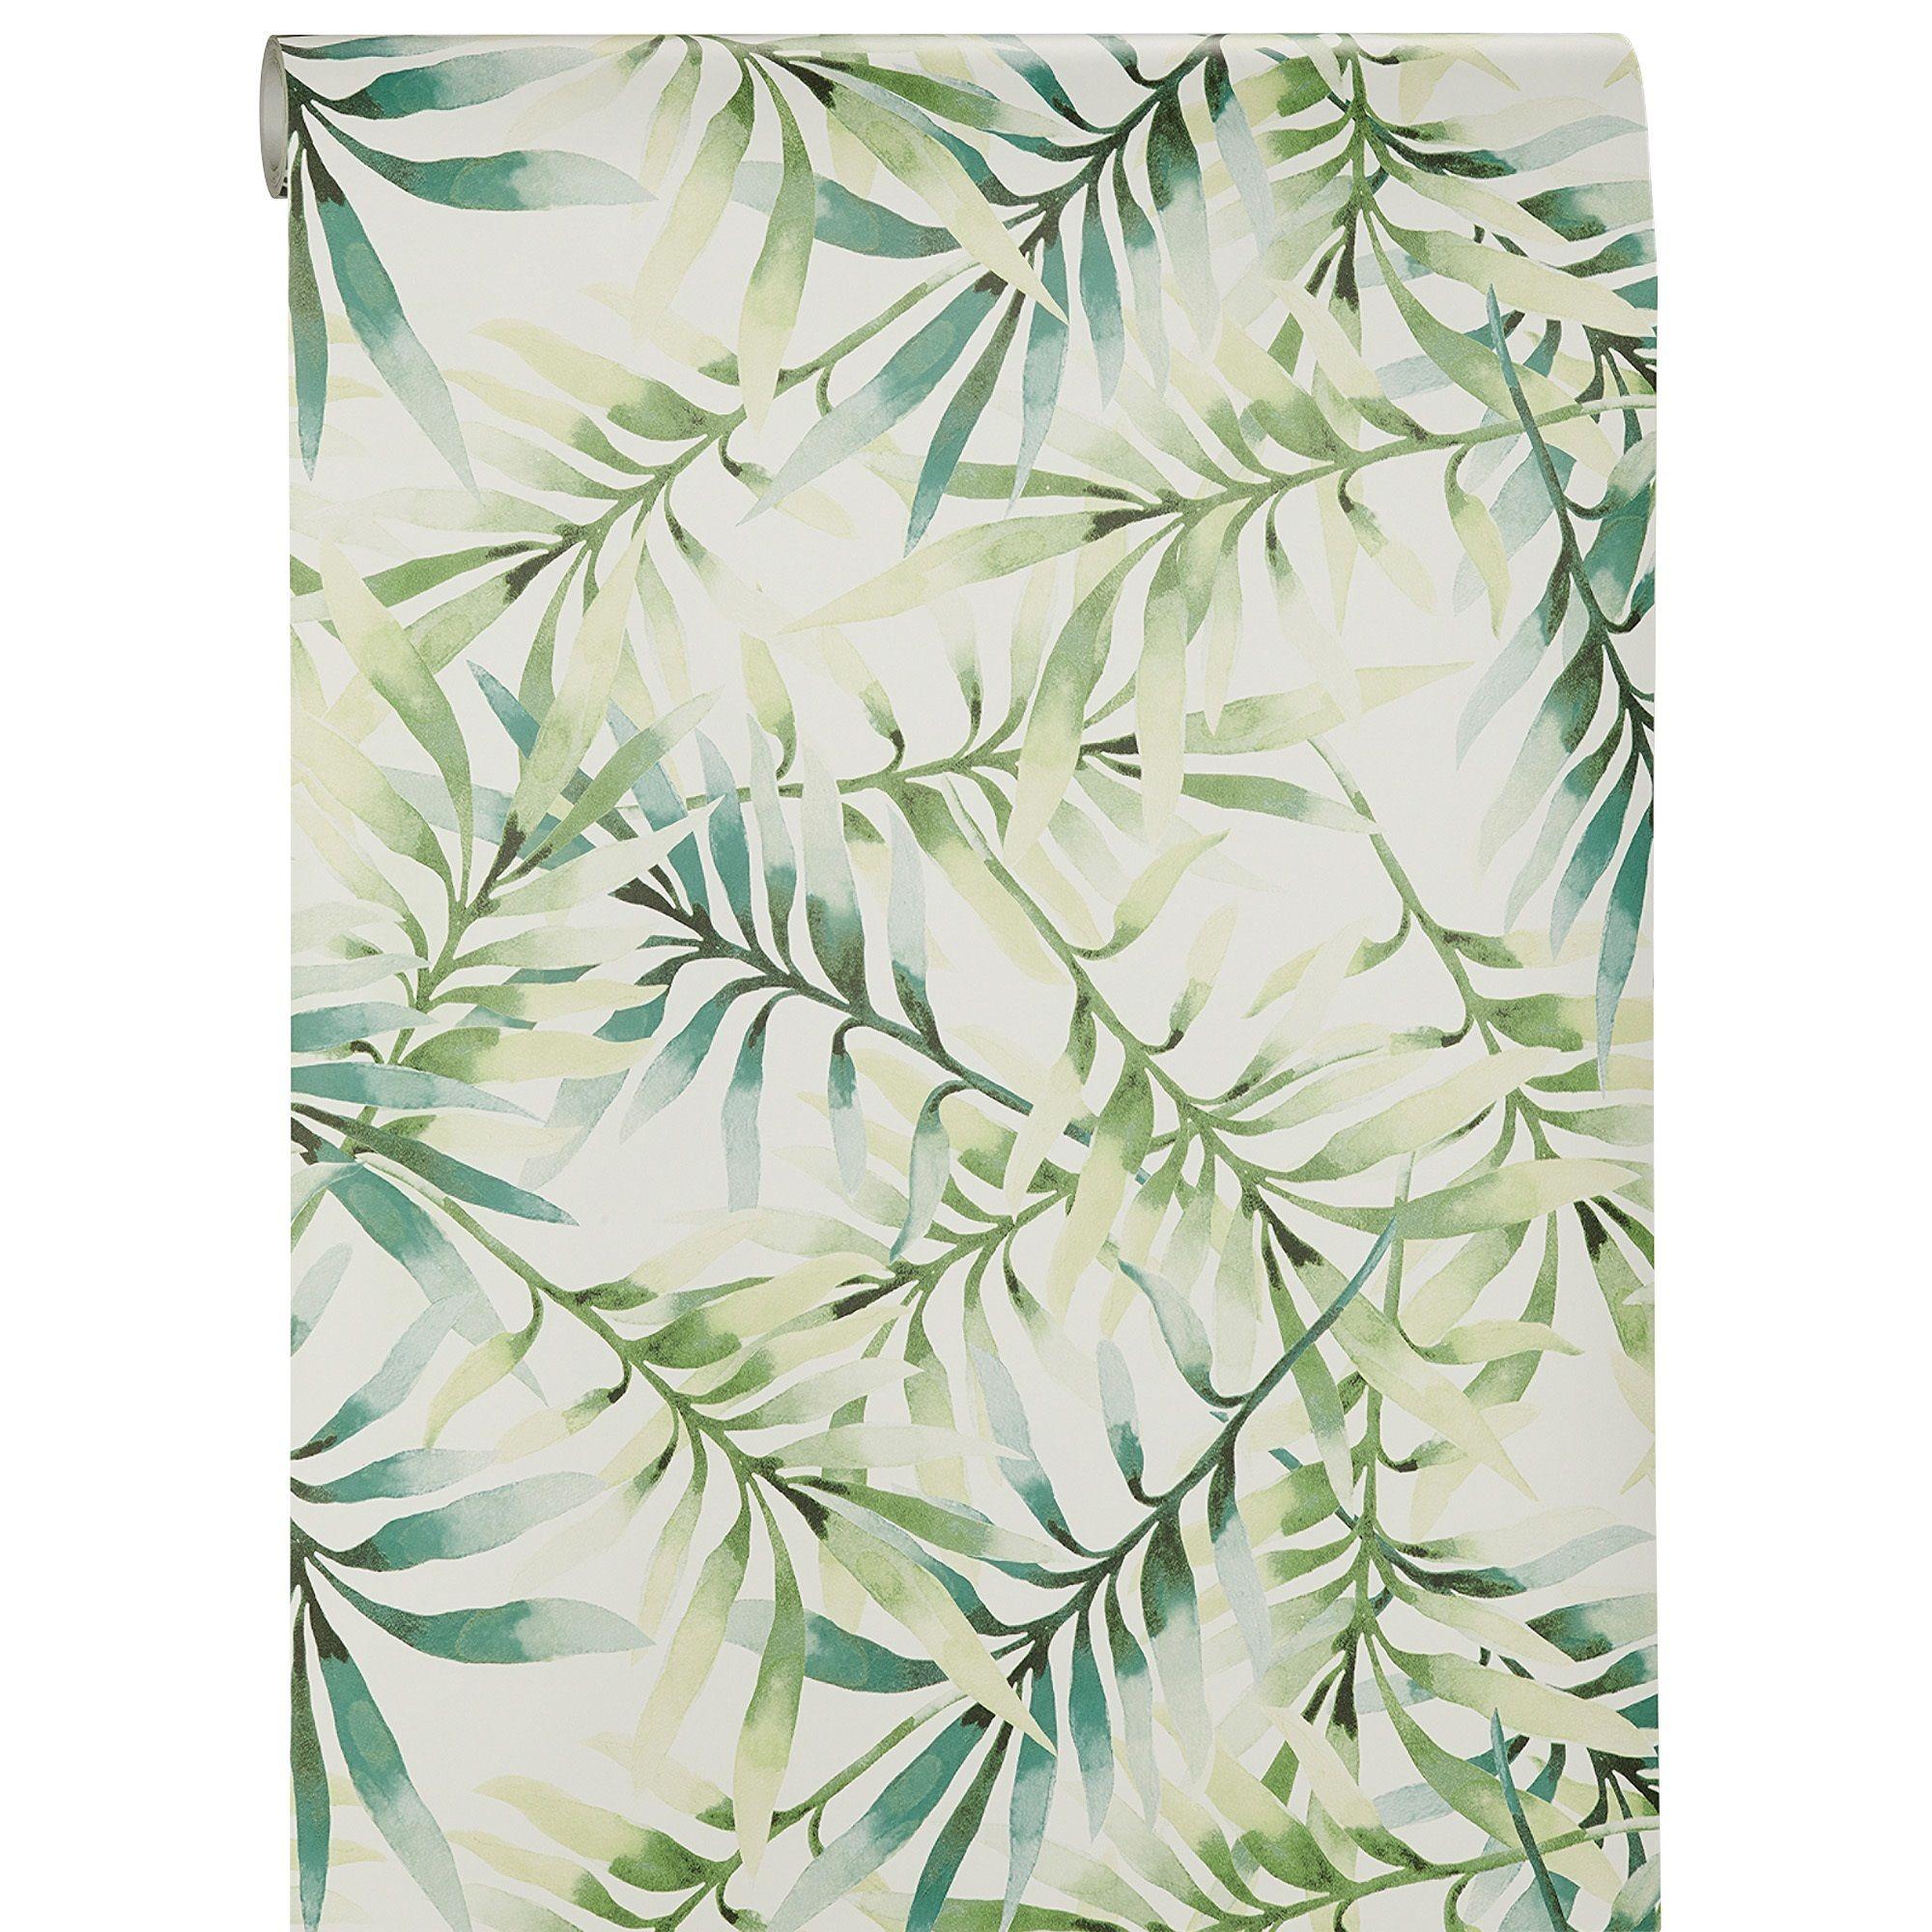 Behang Lente Groen  Wannahaves  Groen behang Behang